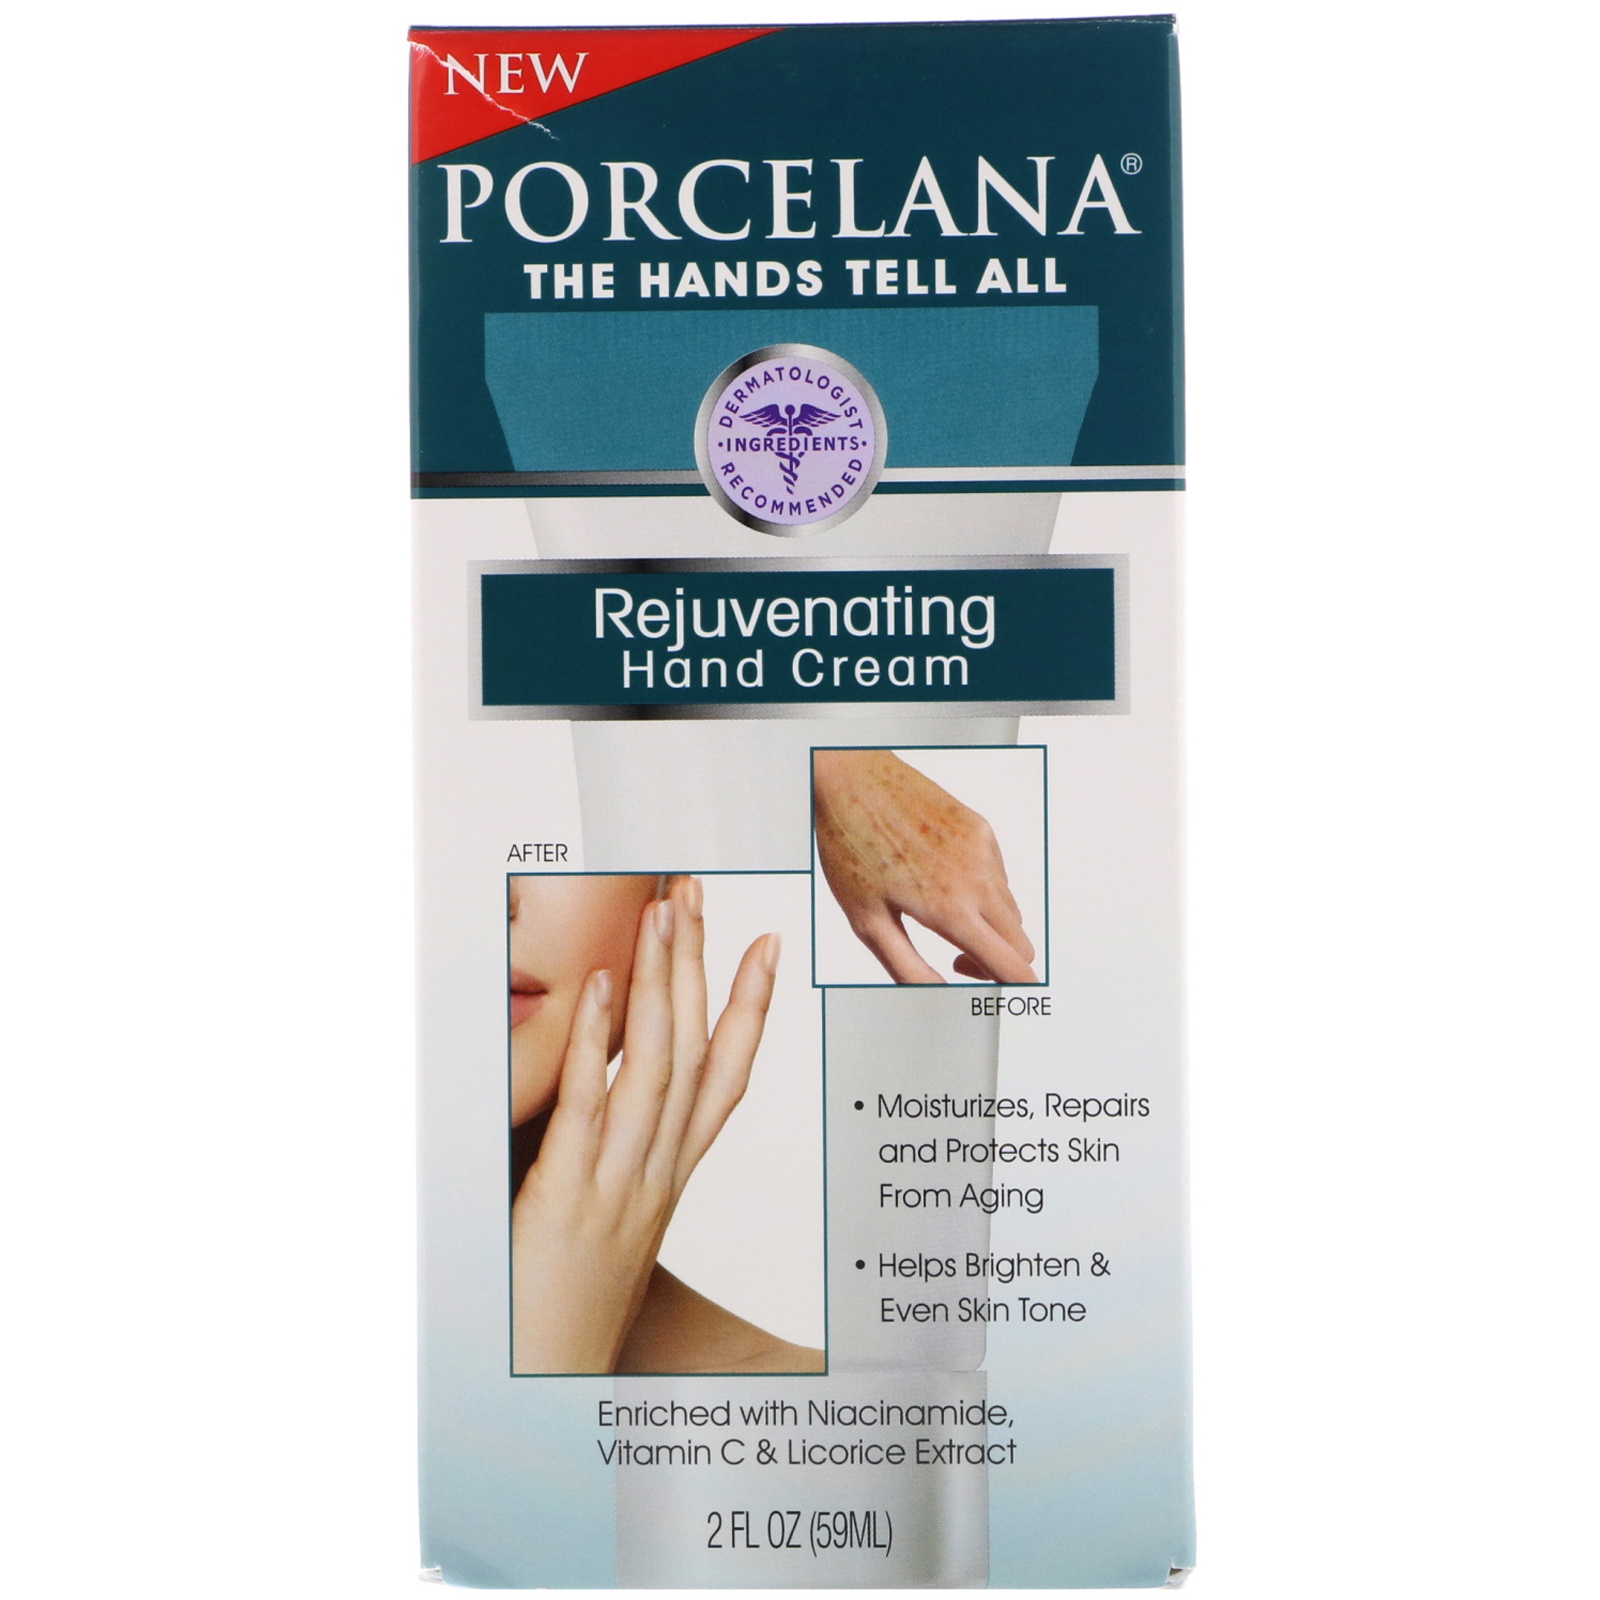 Porcelana, Rejuvenating Hand Cream, 2 Fl Oz (59 Ml)